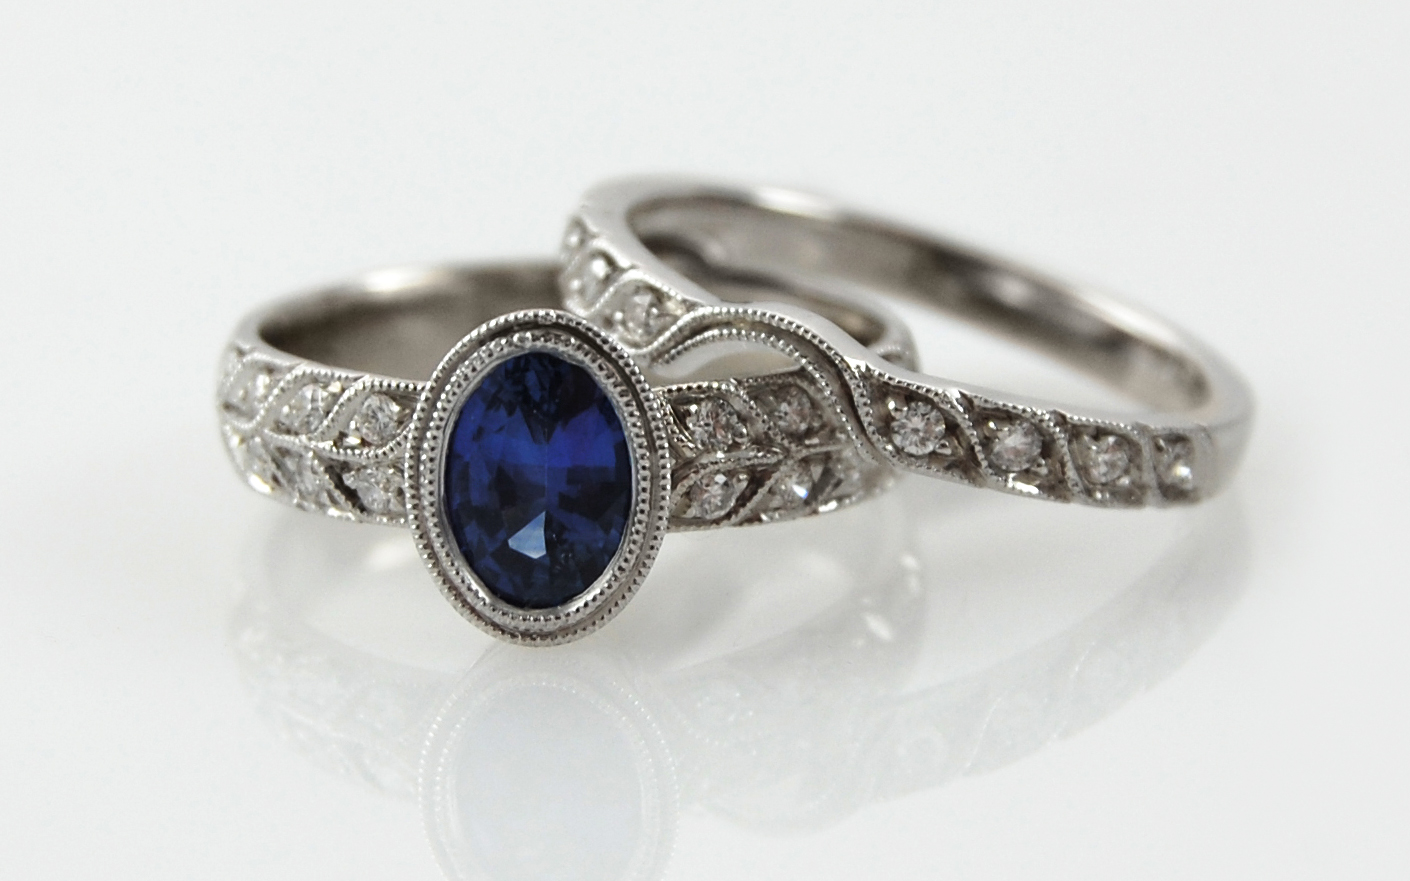 Oval Sapphire with Double Row Bead Set Diamonds